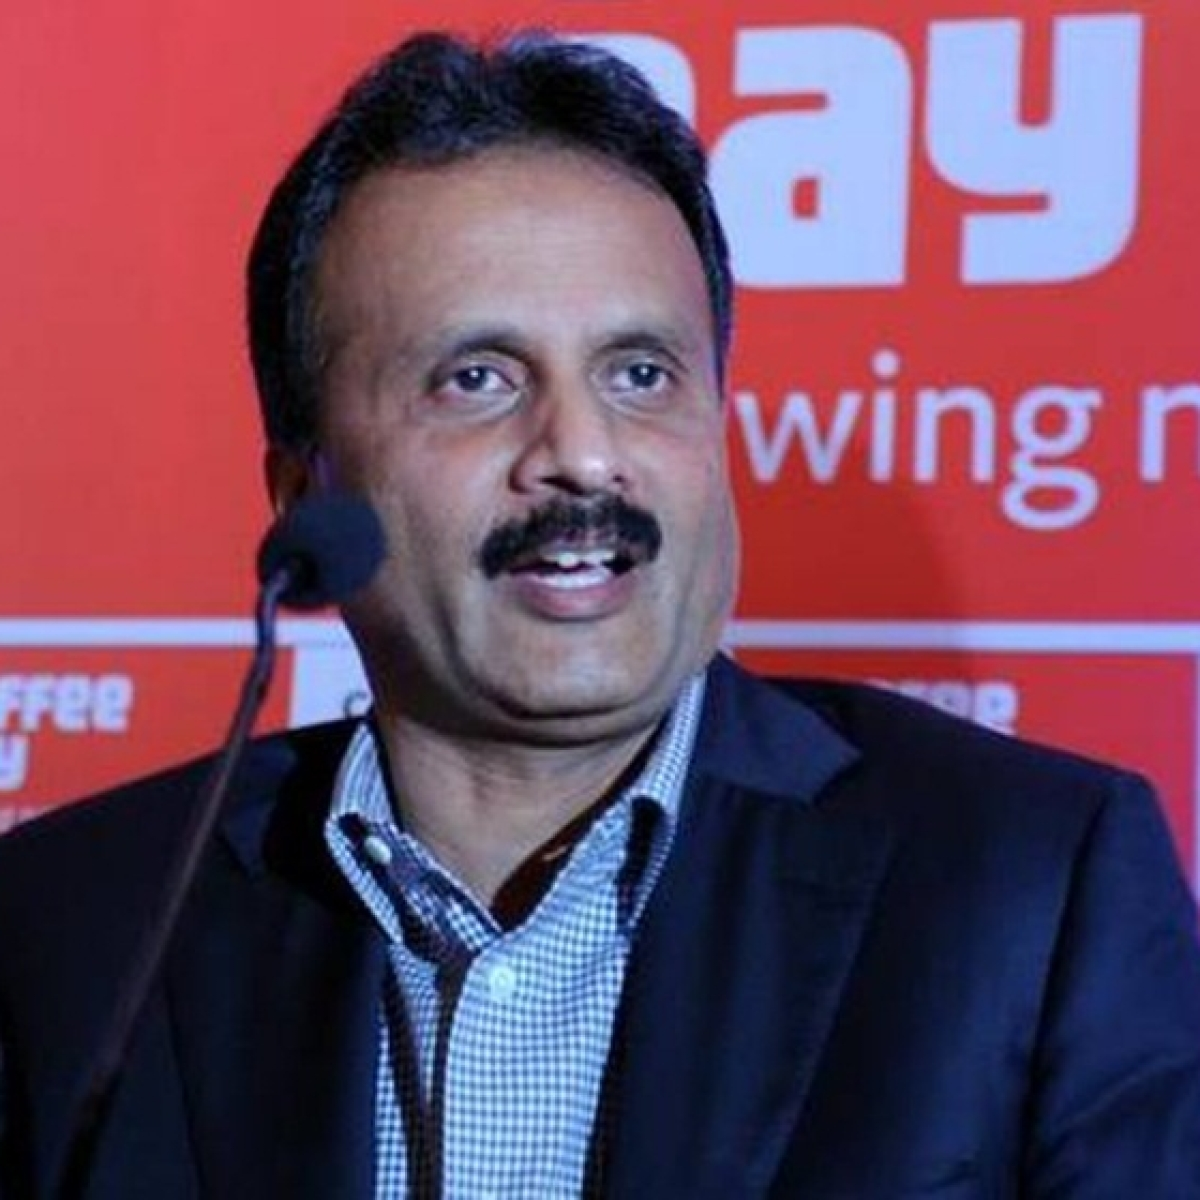 Karnataka: Cafe Coffee Day founder VG Siddhartha goes missing in Mangaluru